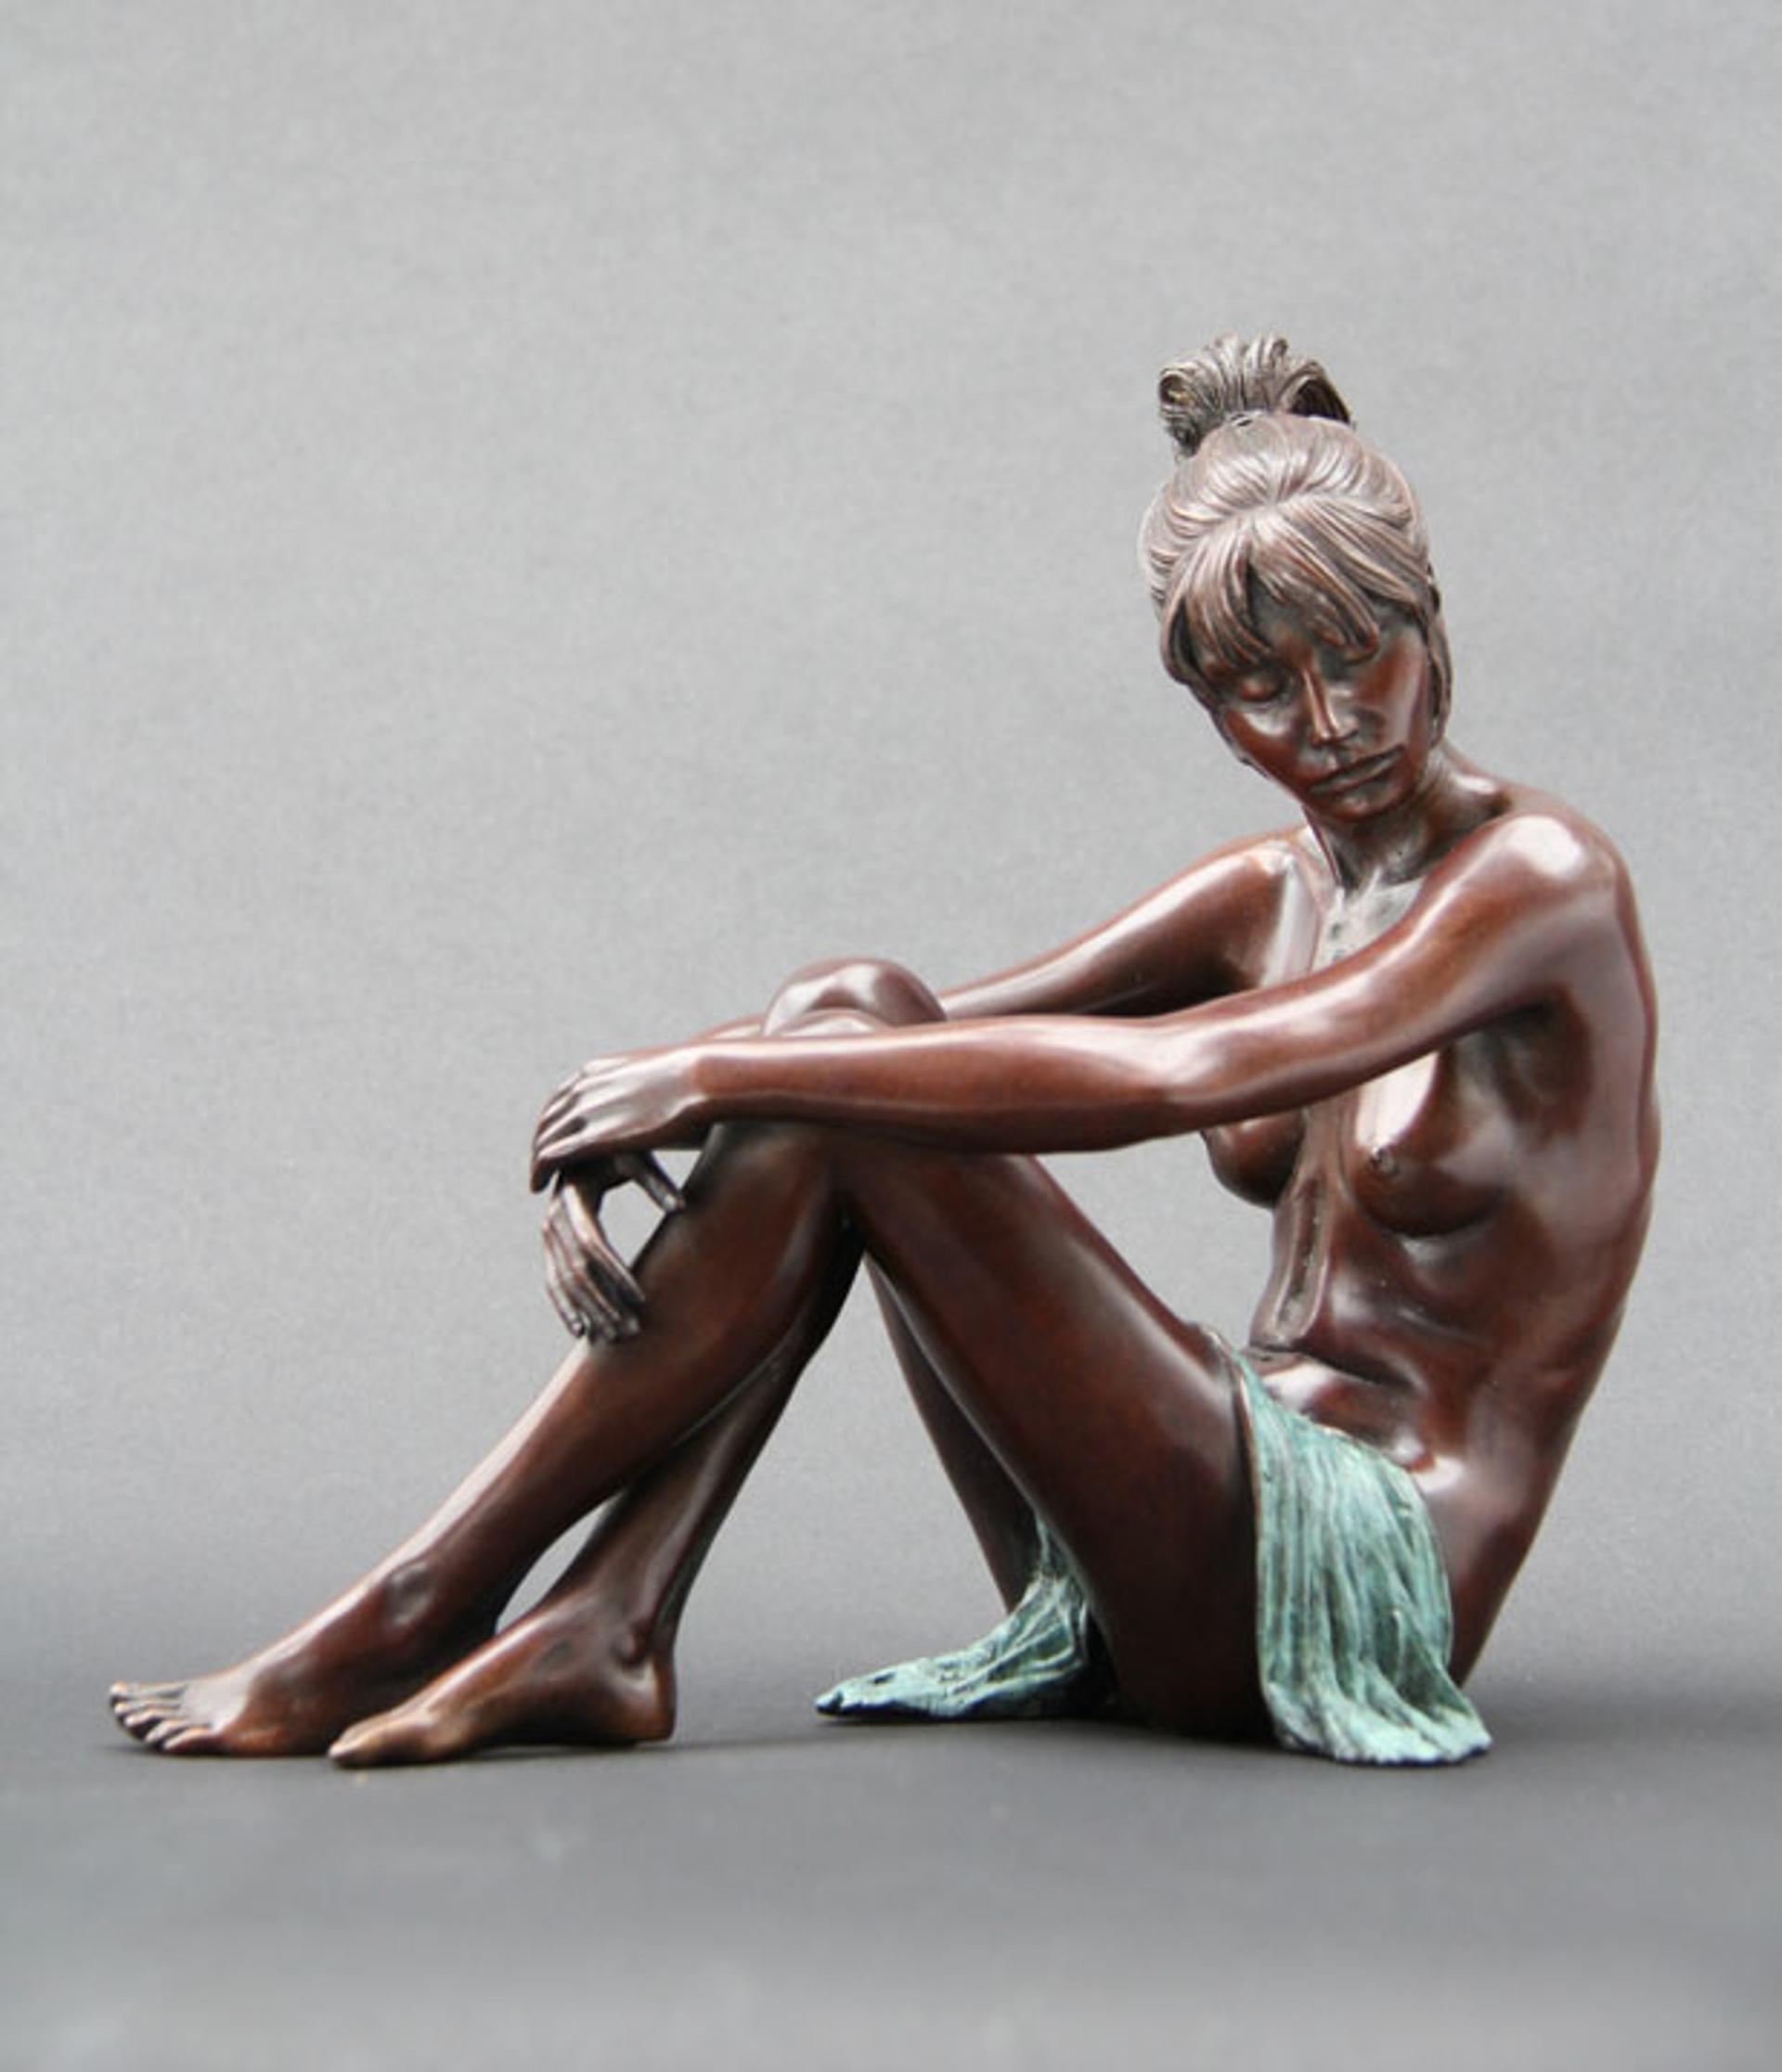 Bather - Daydream by Michael Talbot